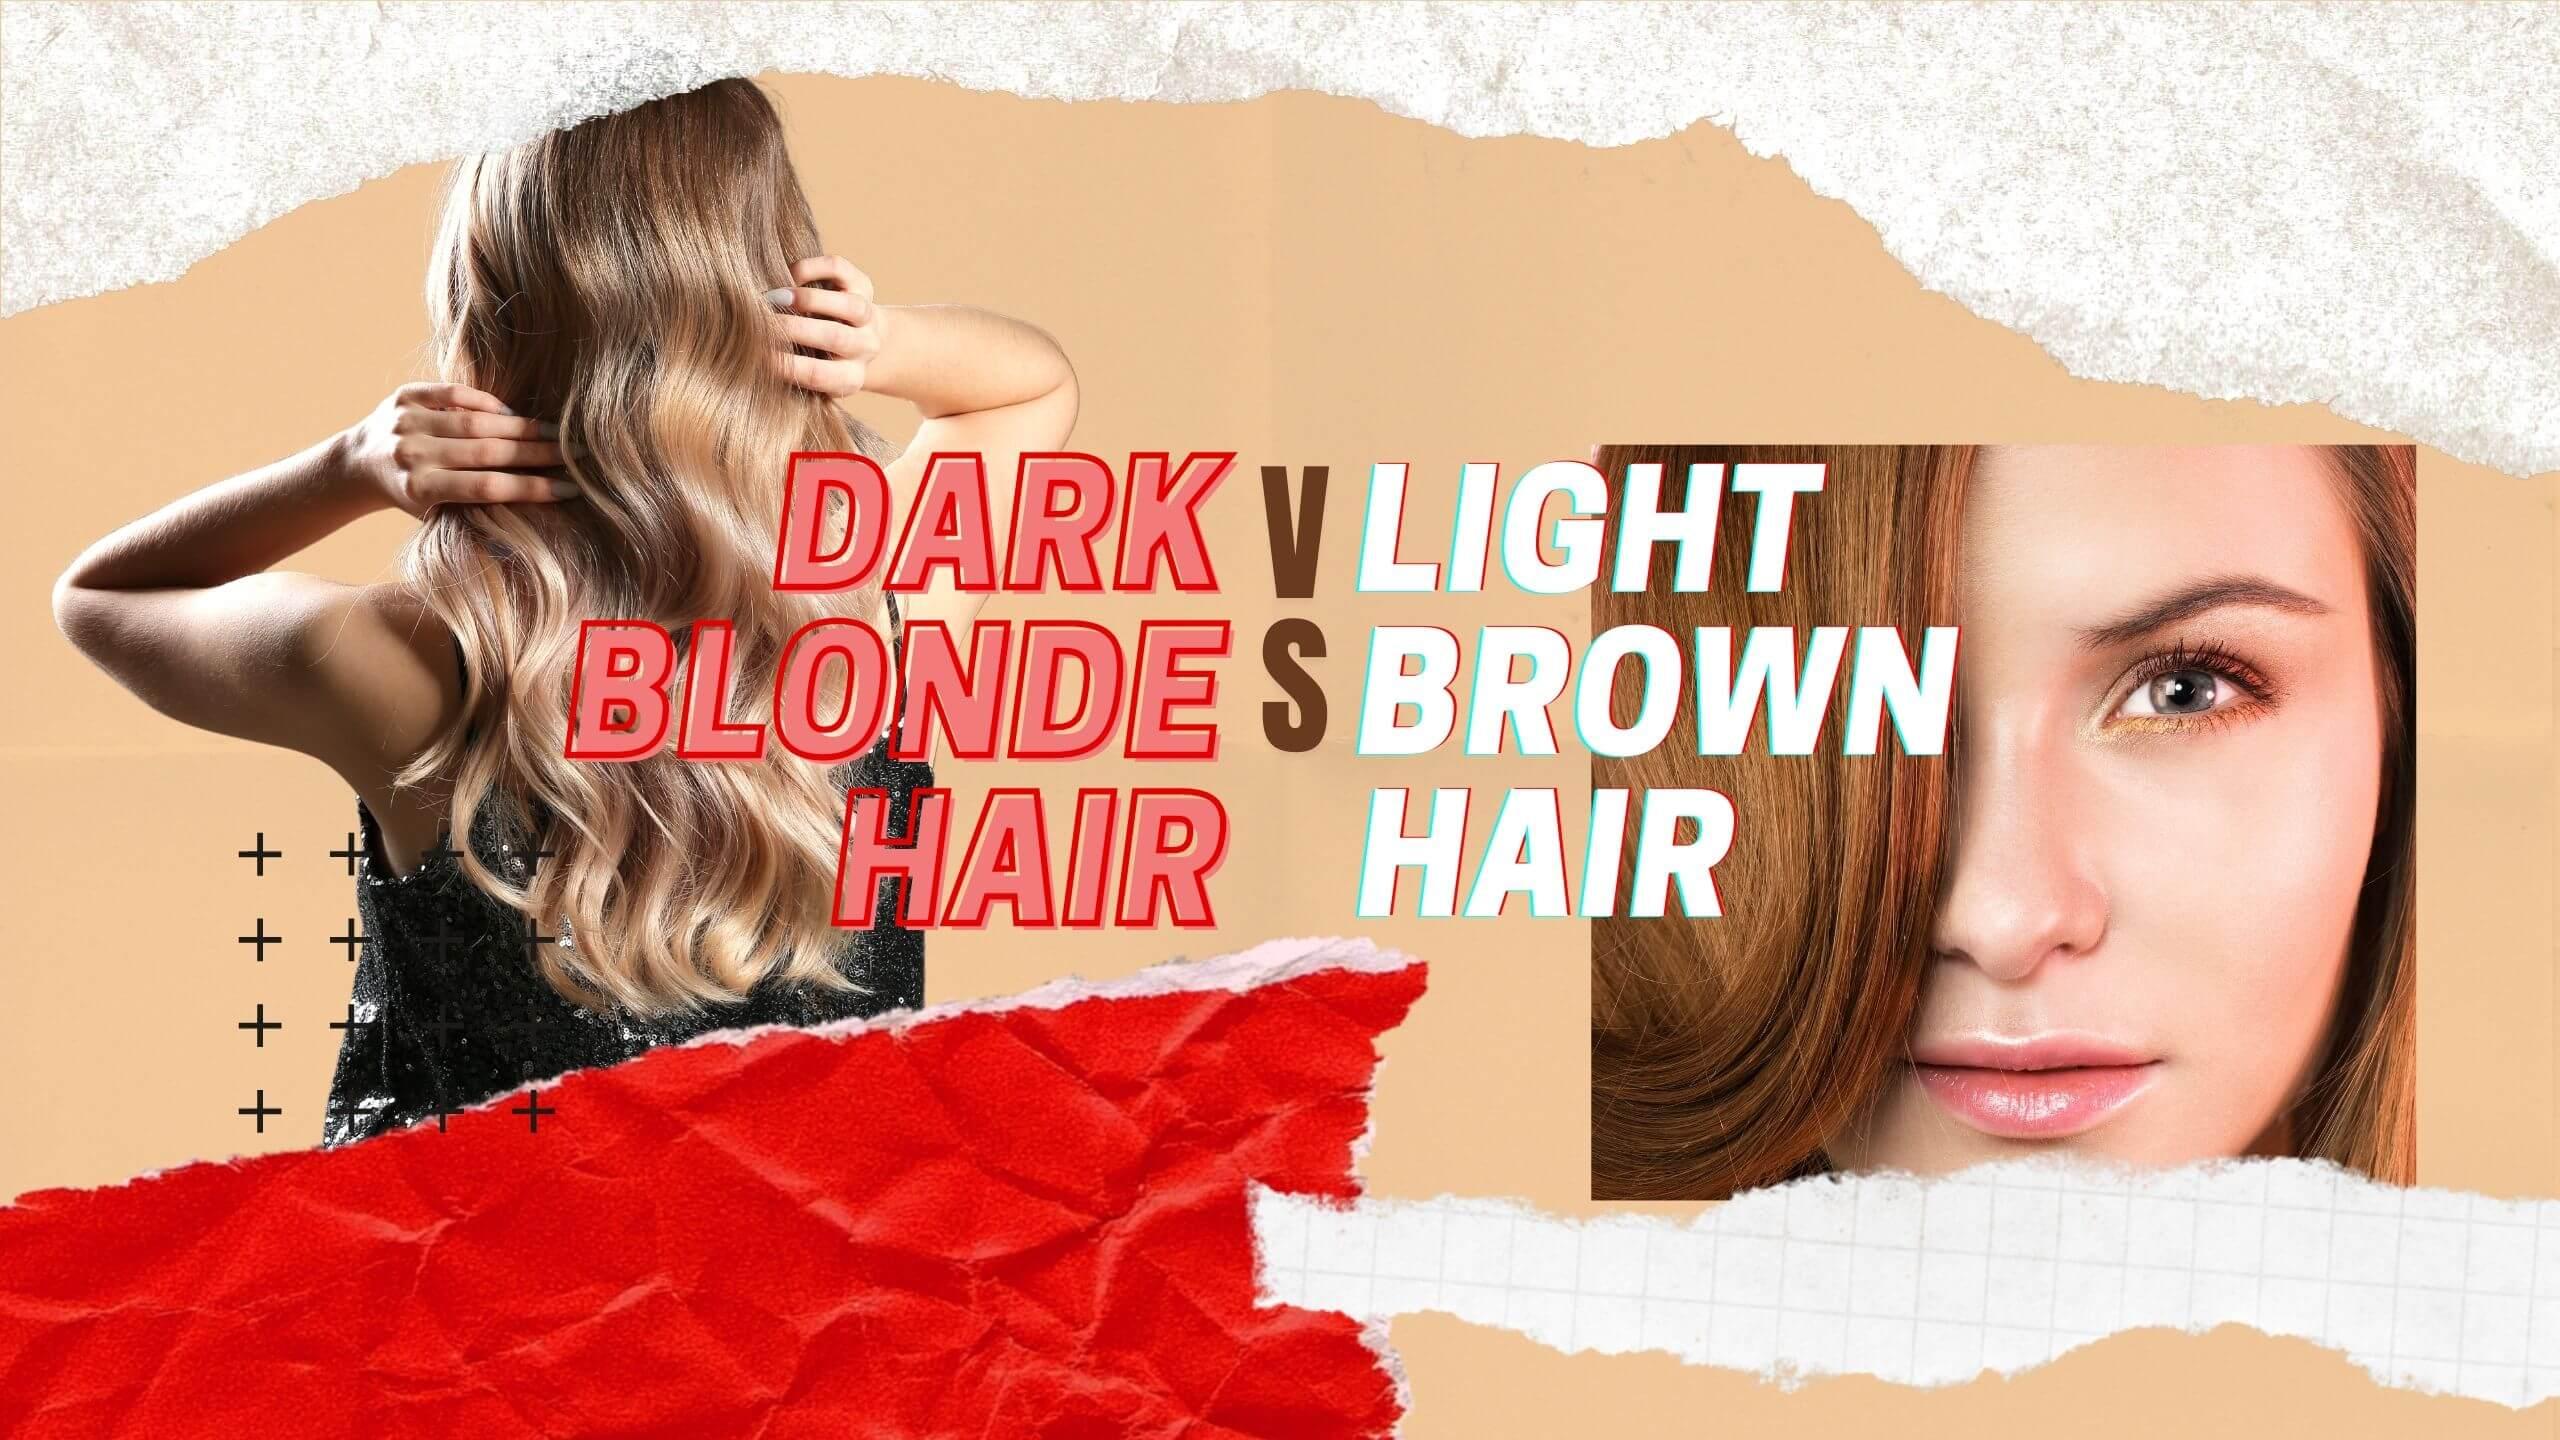 Dark Blonde Hair vs Light Brown Hair